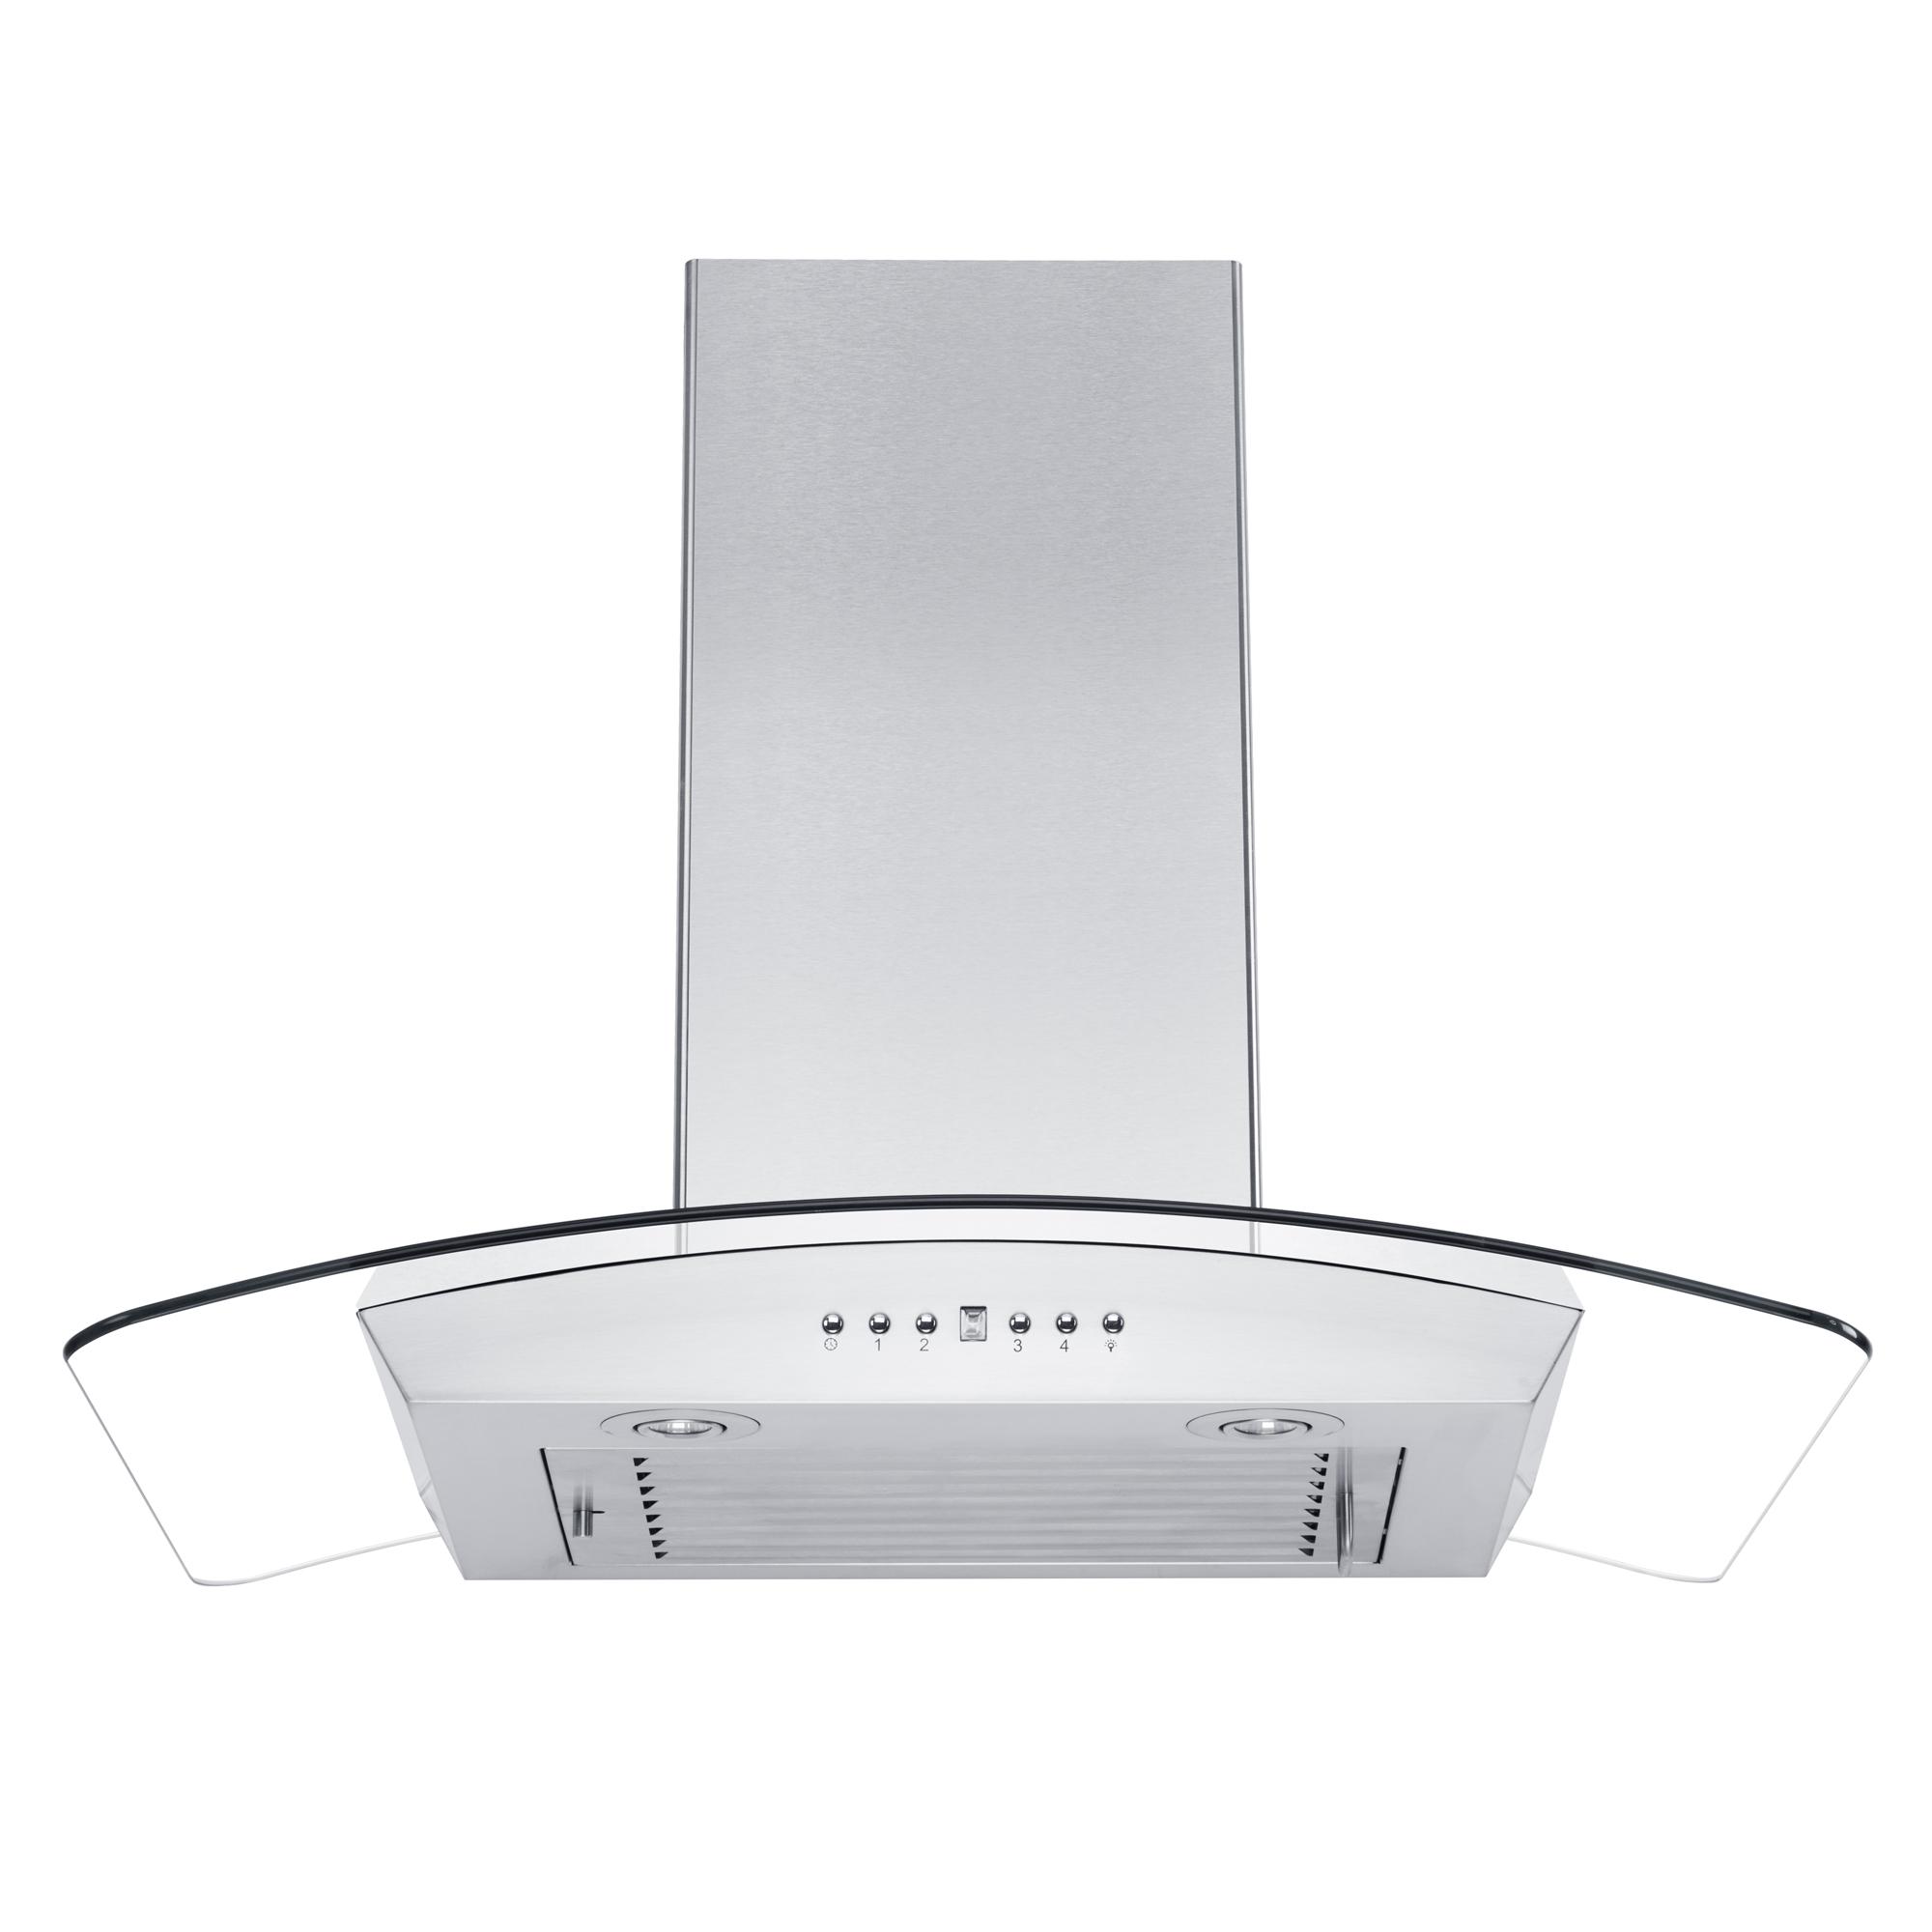 zline-stainless-steel-wall-mounted-range-hood-KZ-new-under.jpg